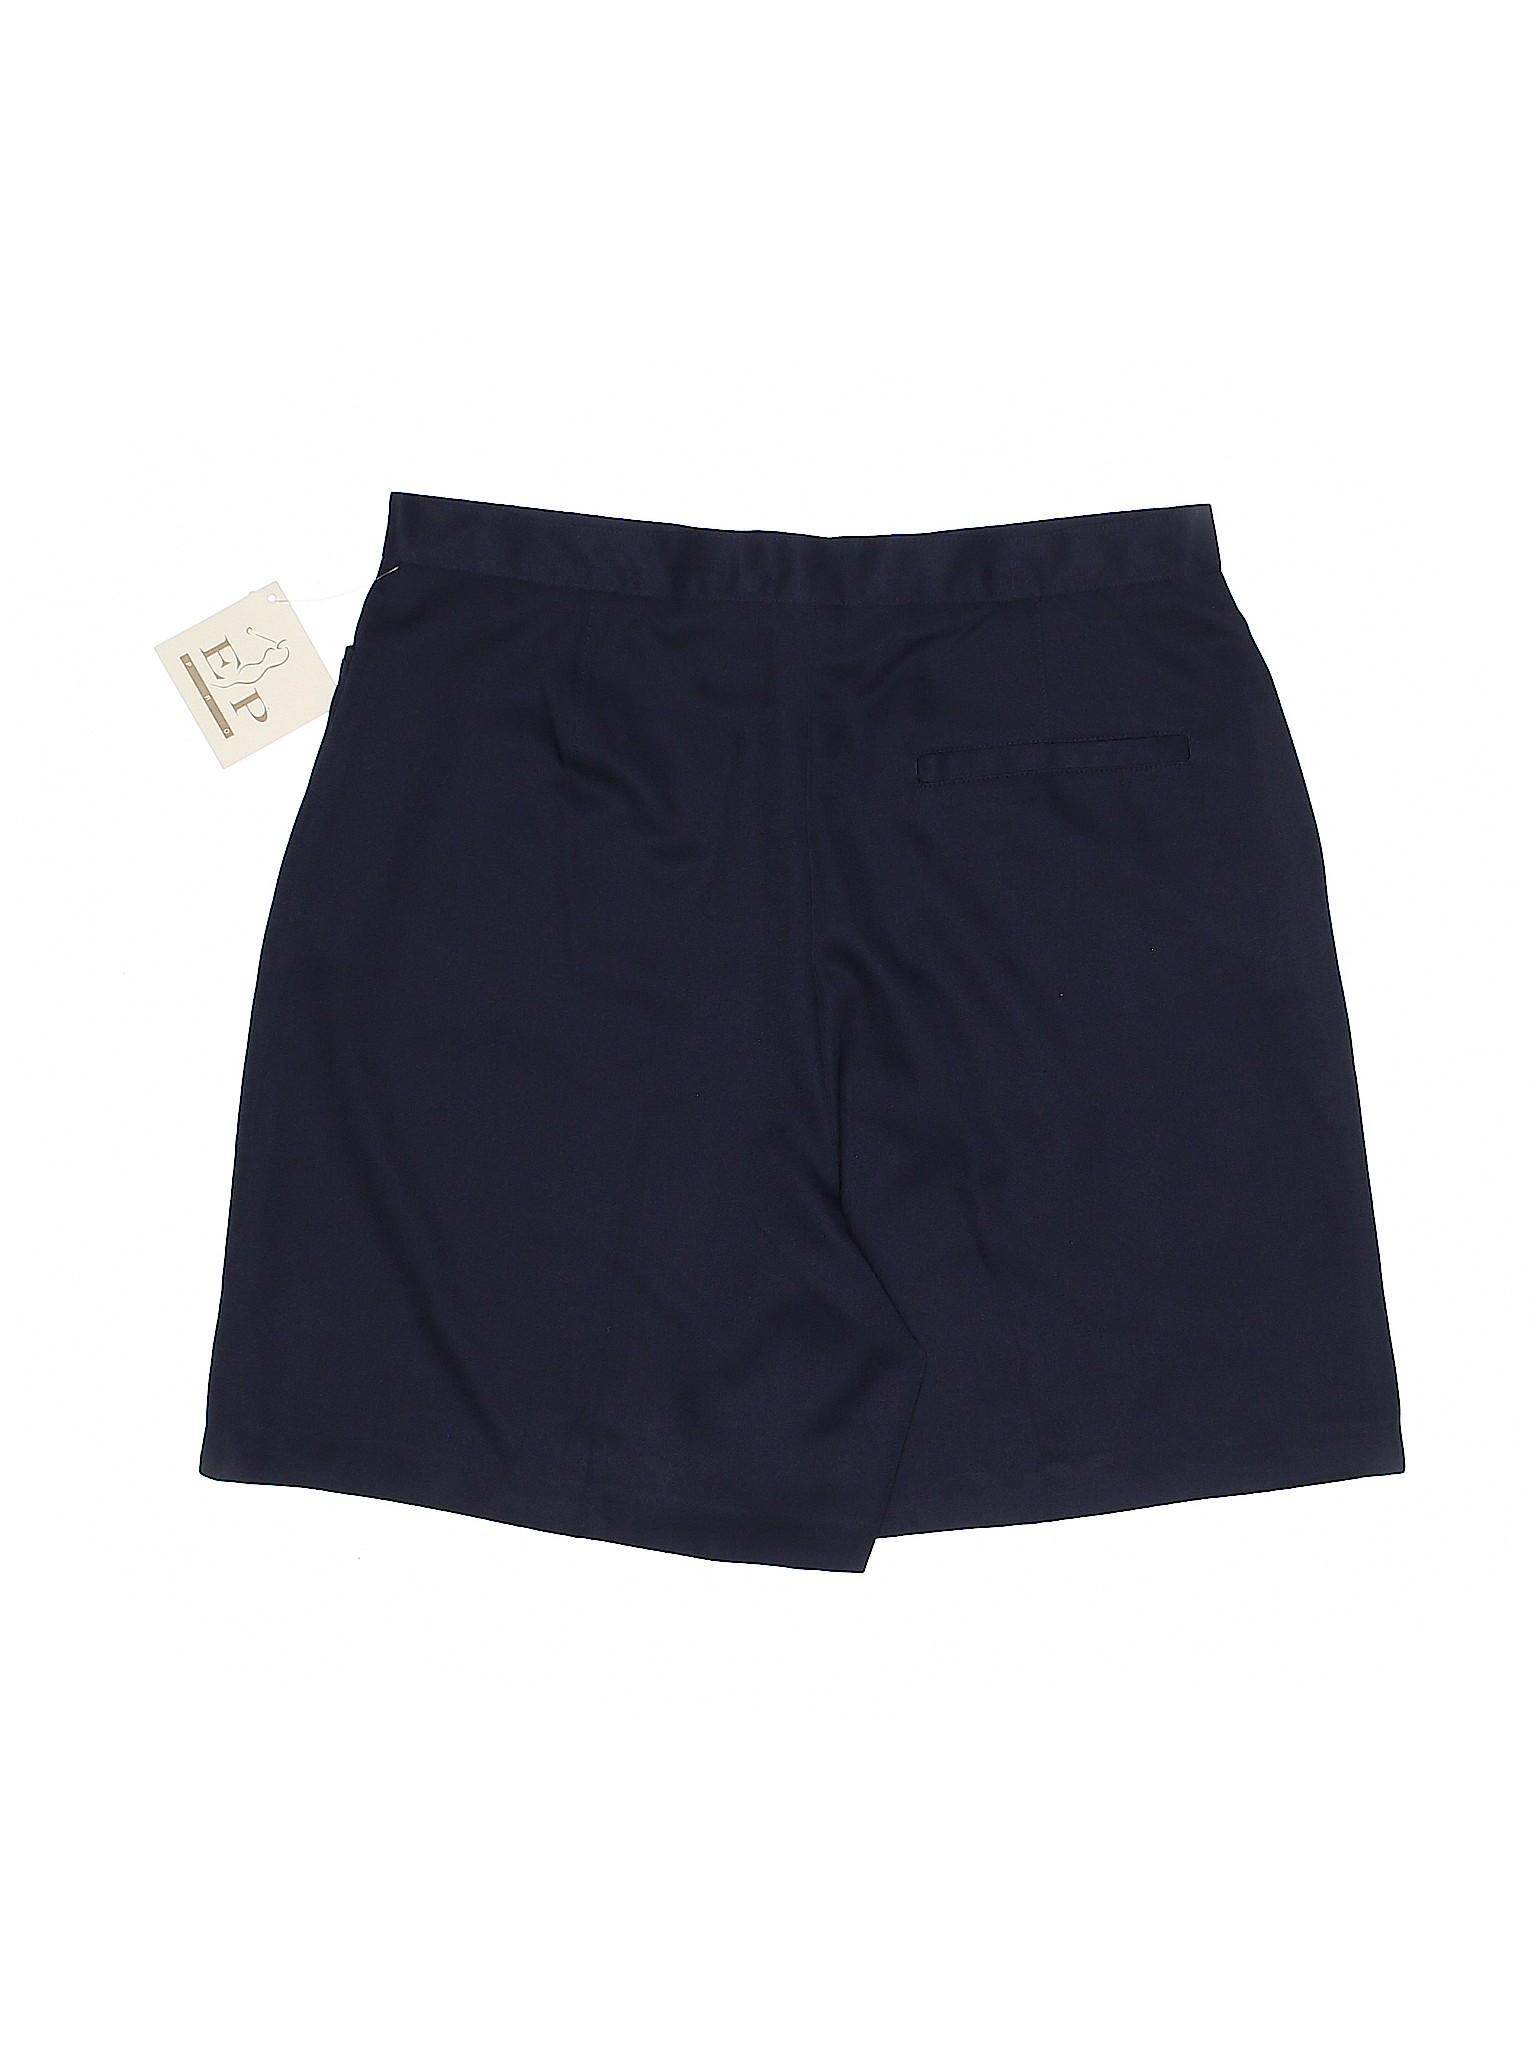 Pro Athletic Boutique EP Boutique Pro Shorts EP Athletic Shorts Ugdy1q